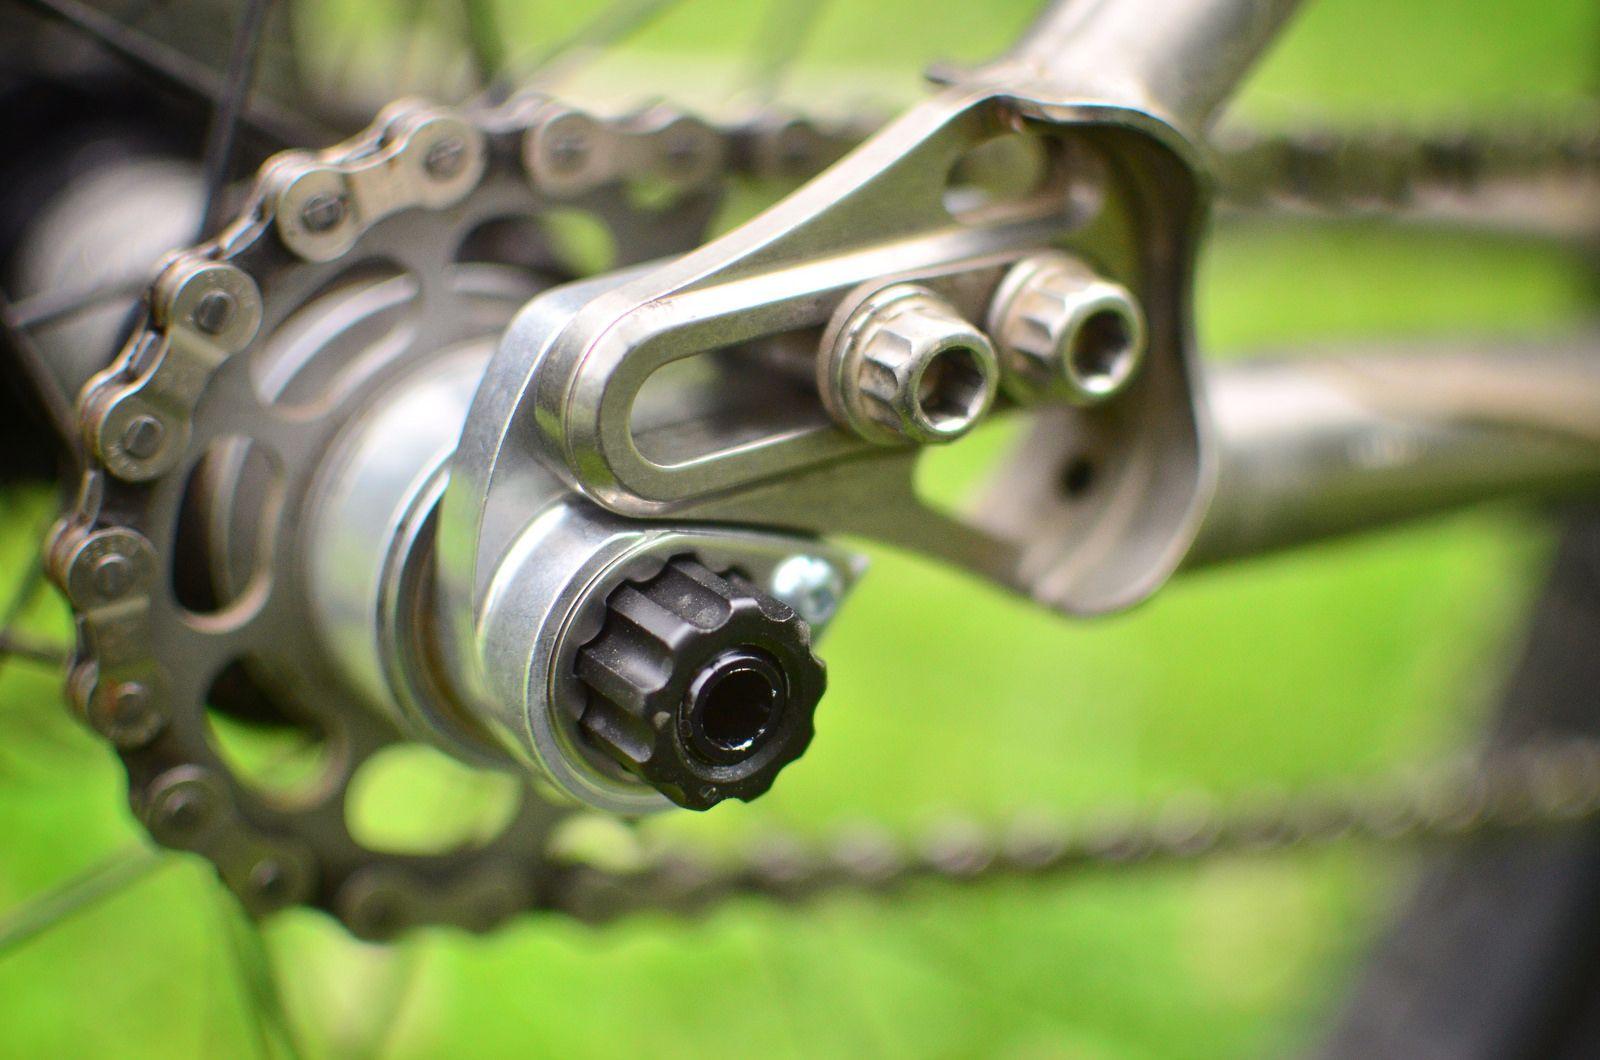 Singlespeed Through Axle Dropout Bike Design Bike Details Bike